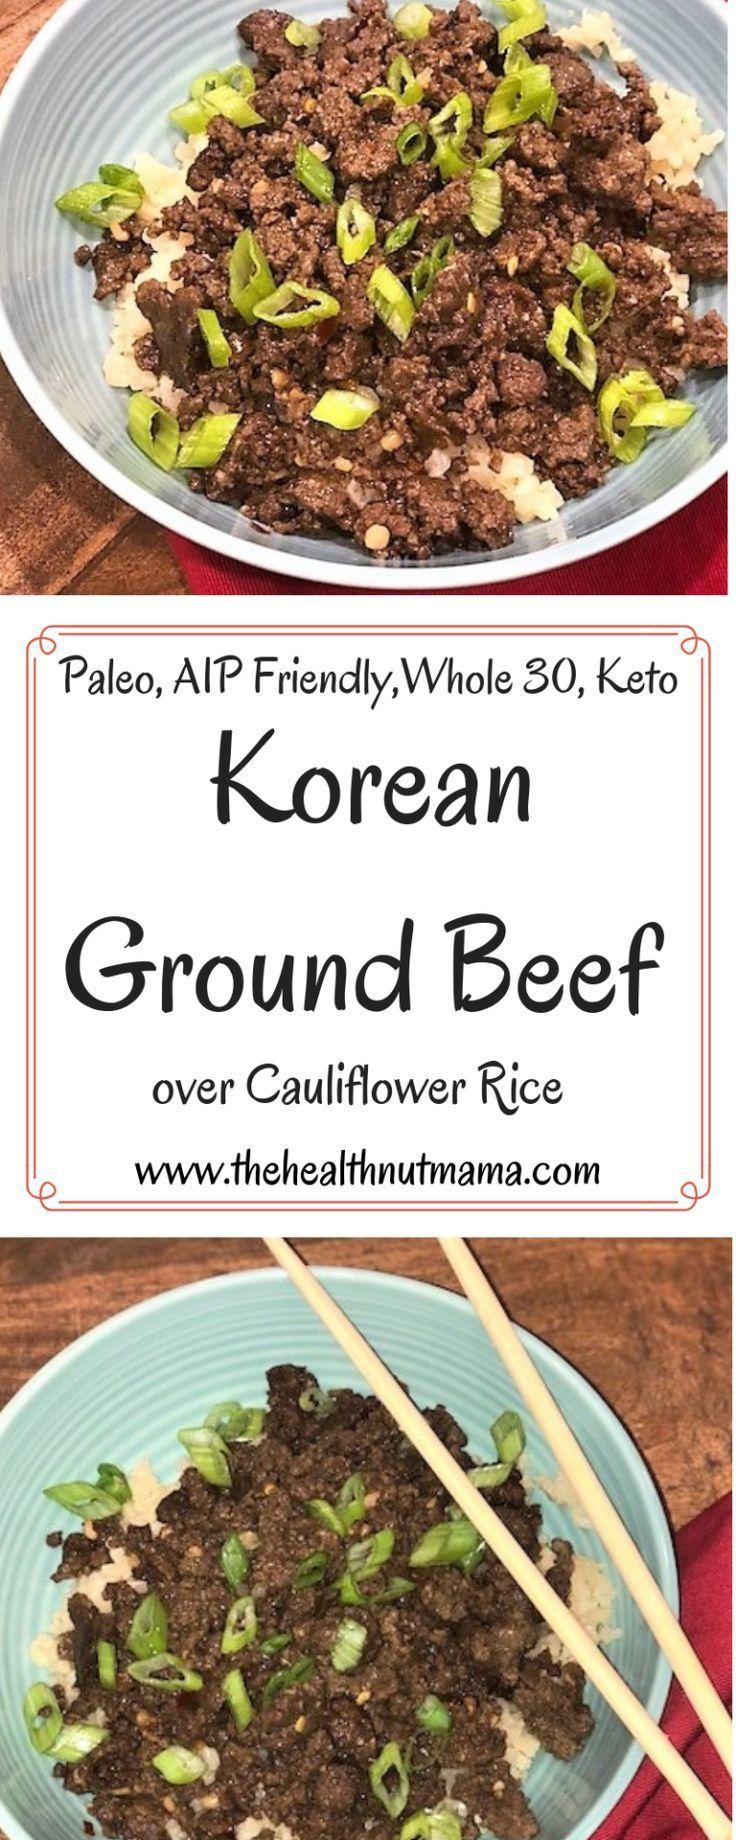 Paleo Korean Ground Beef Over Cauliflower Rice The Health Nut Mama Ground Beef Paleo Recipes Paleo Ground Beef Paleo Recipes Easy